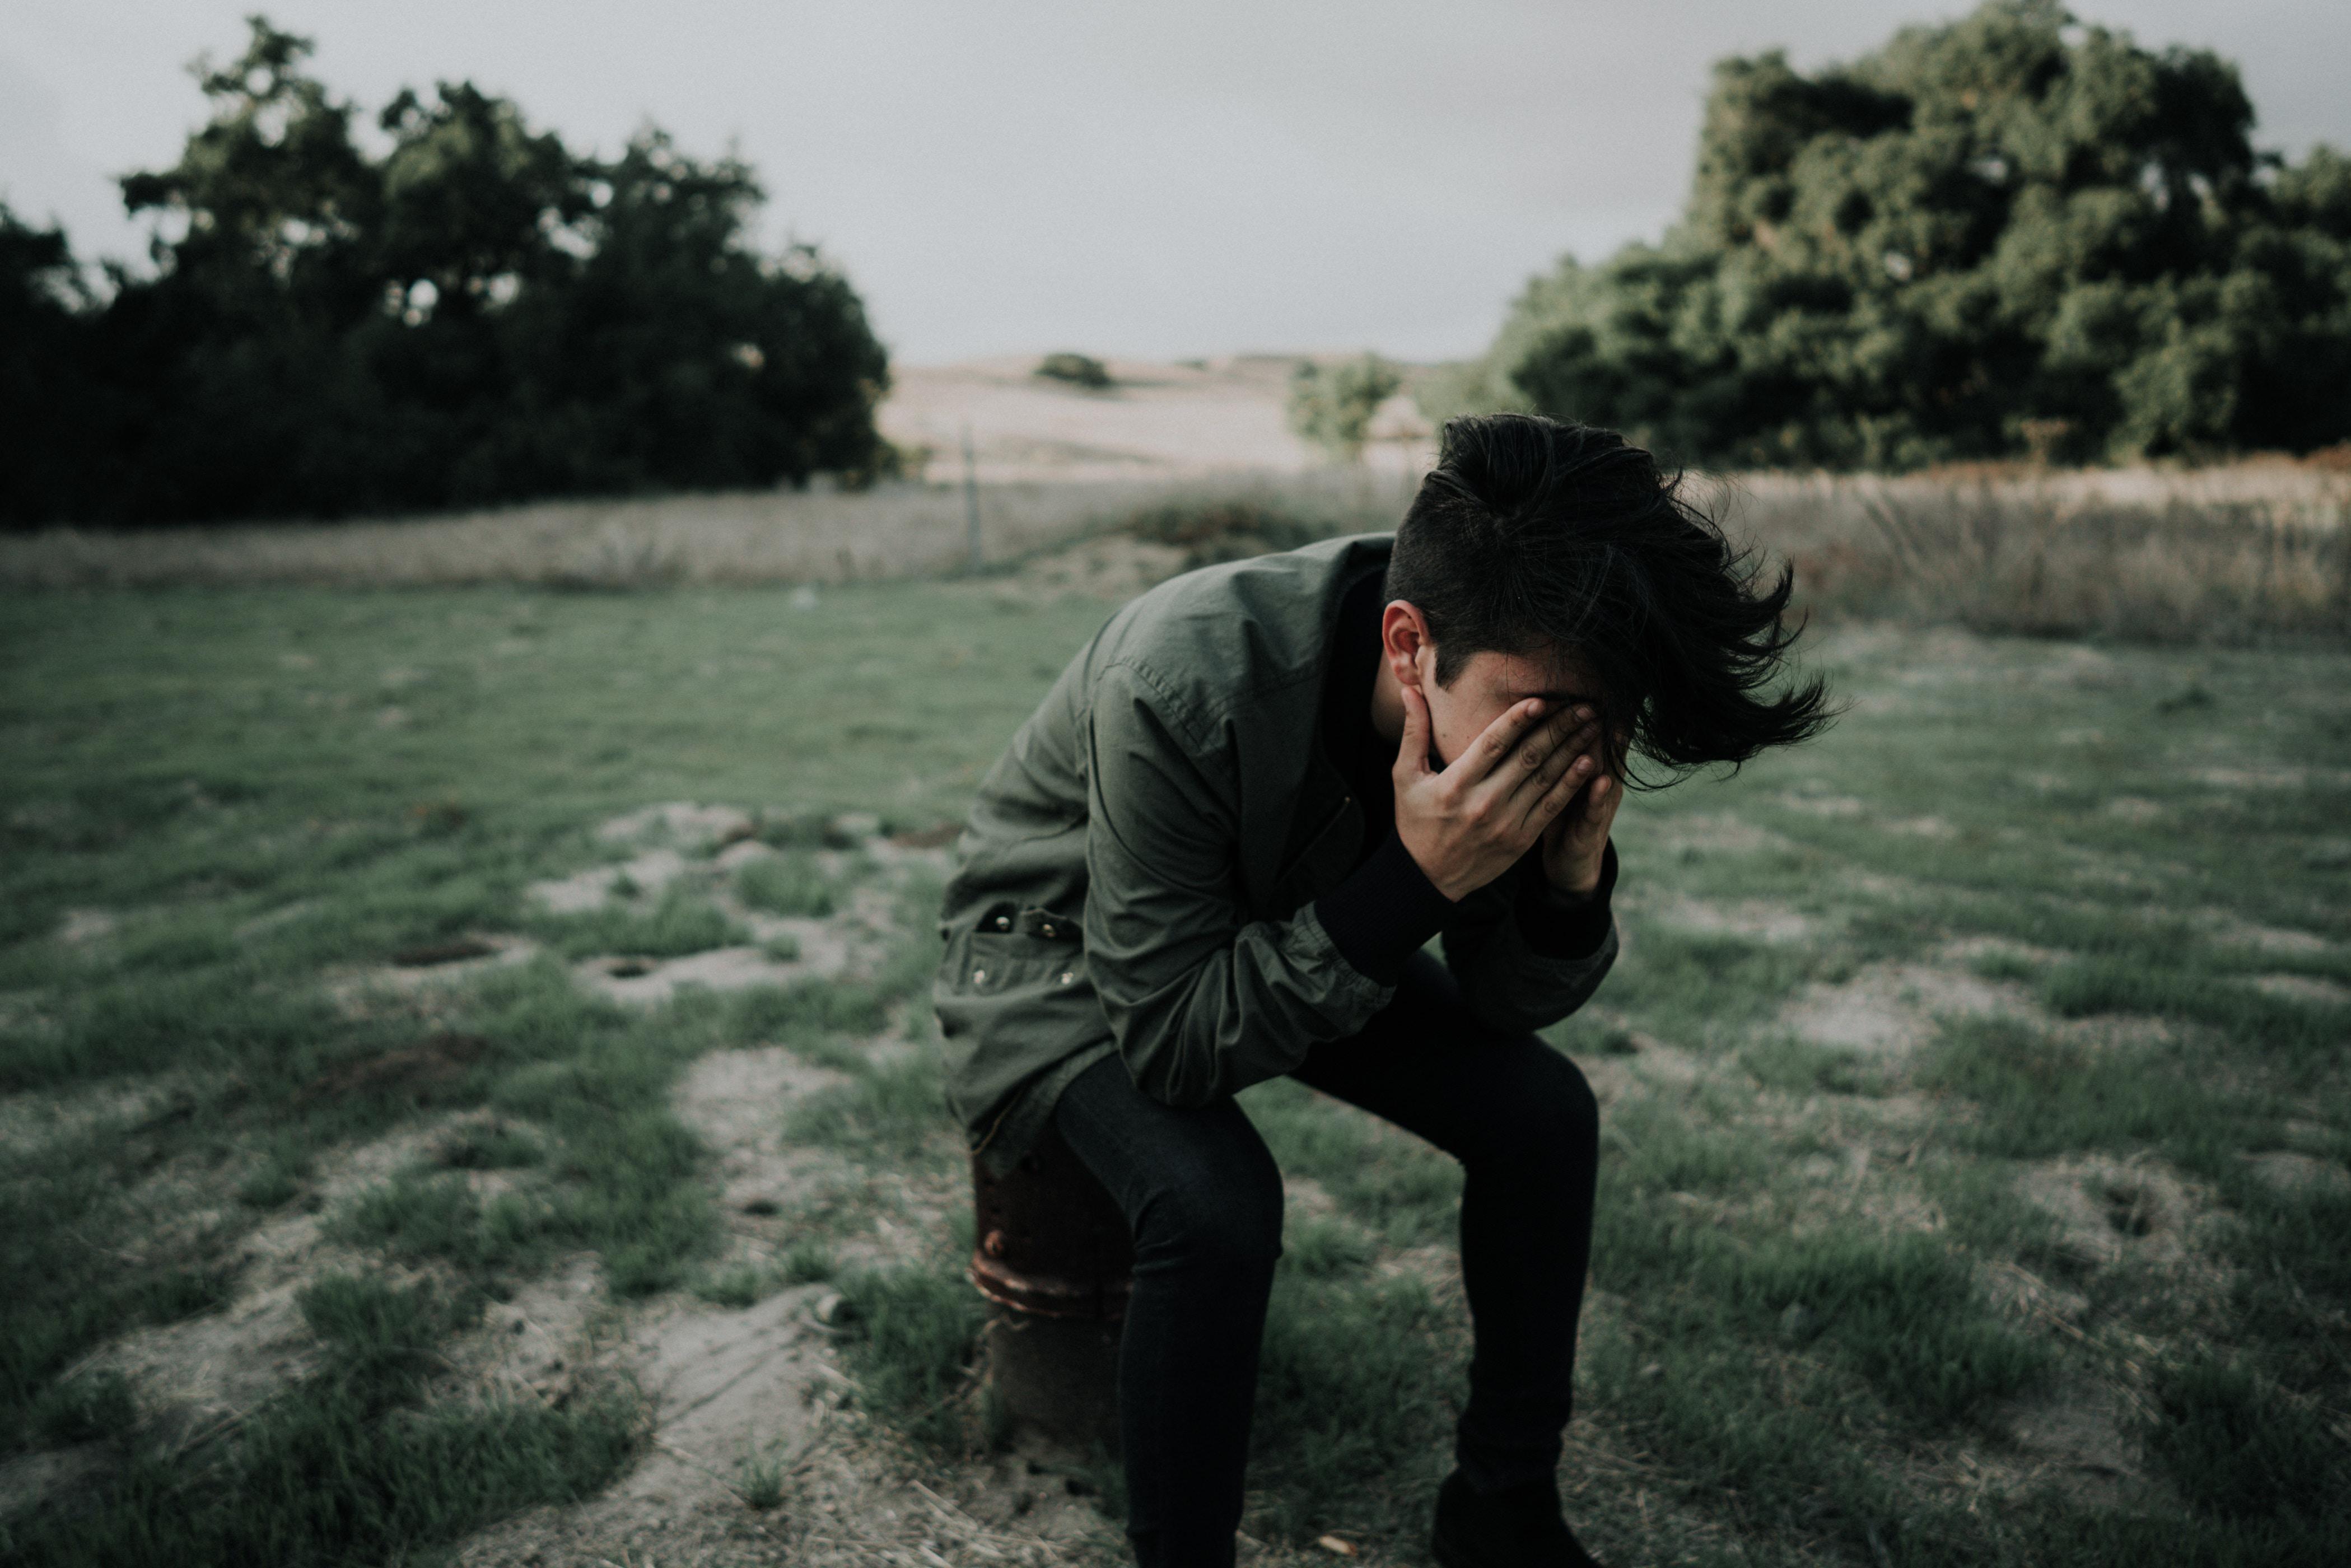 Sorrowful man